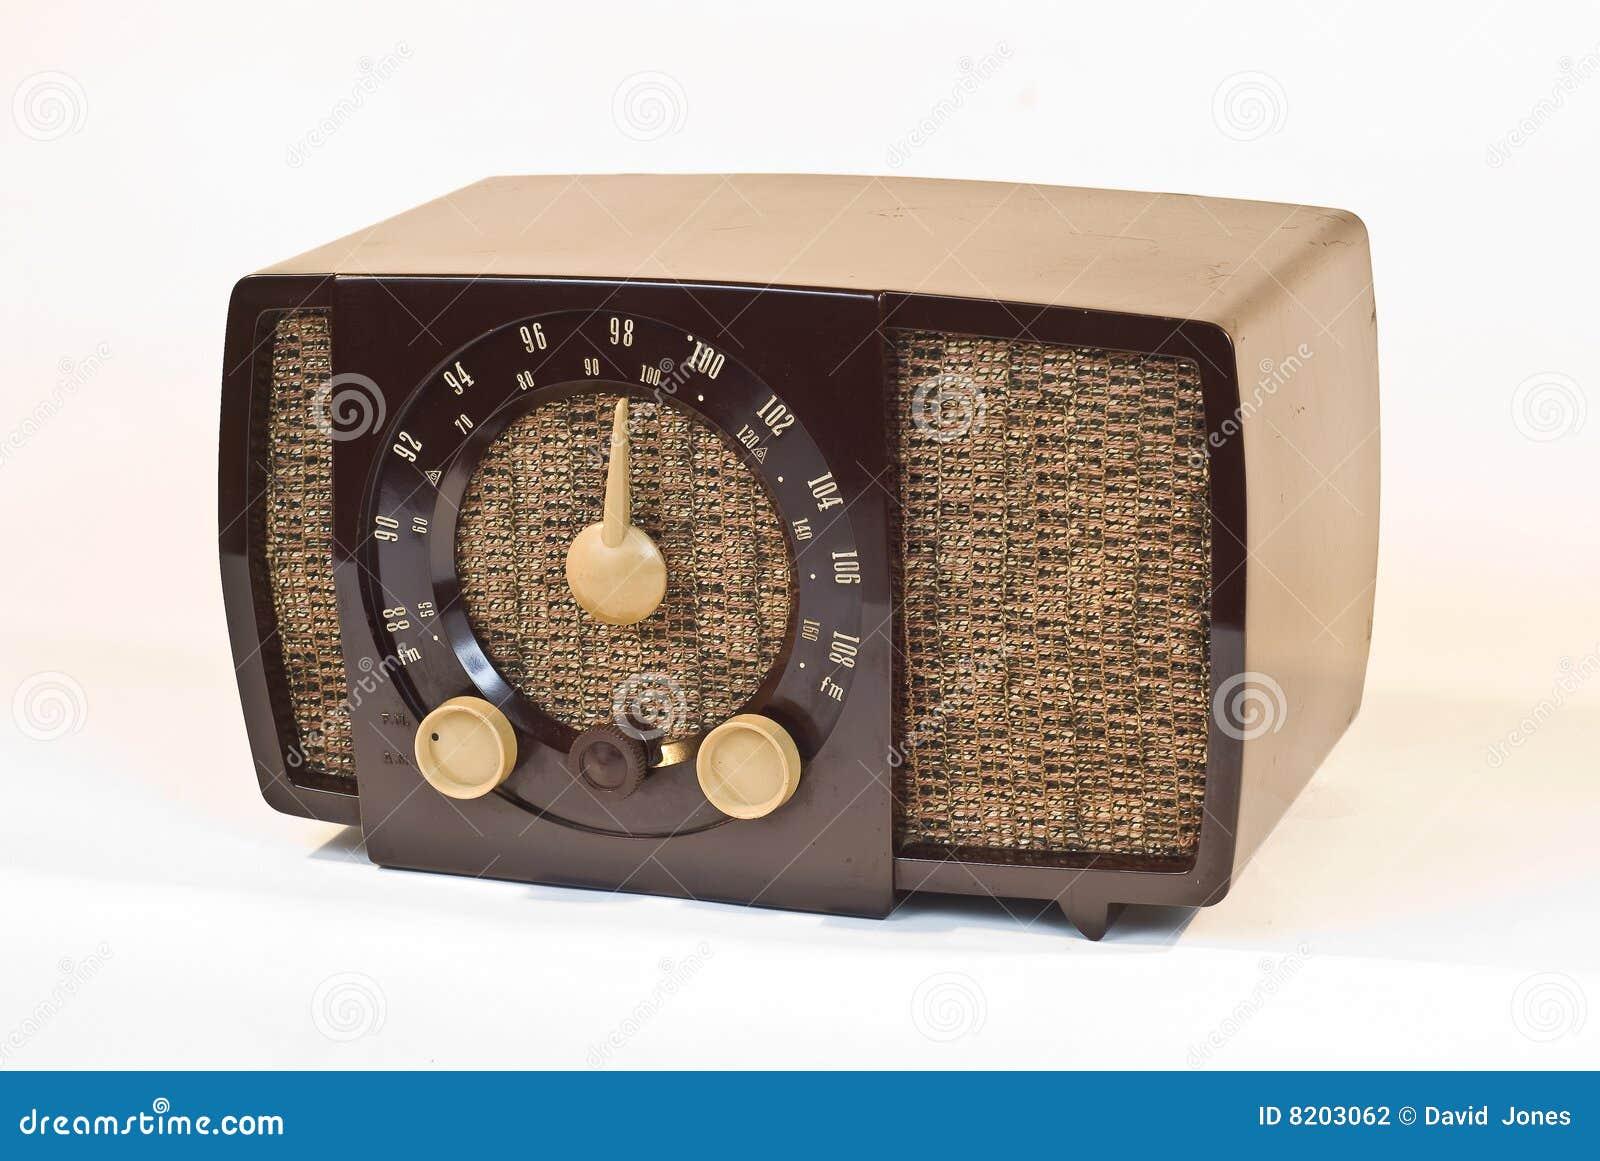 old art deco radio stock photo image of bakelite communication 8203062. Black Bedroom Furniture Sets. Home Design Ideas